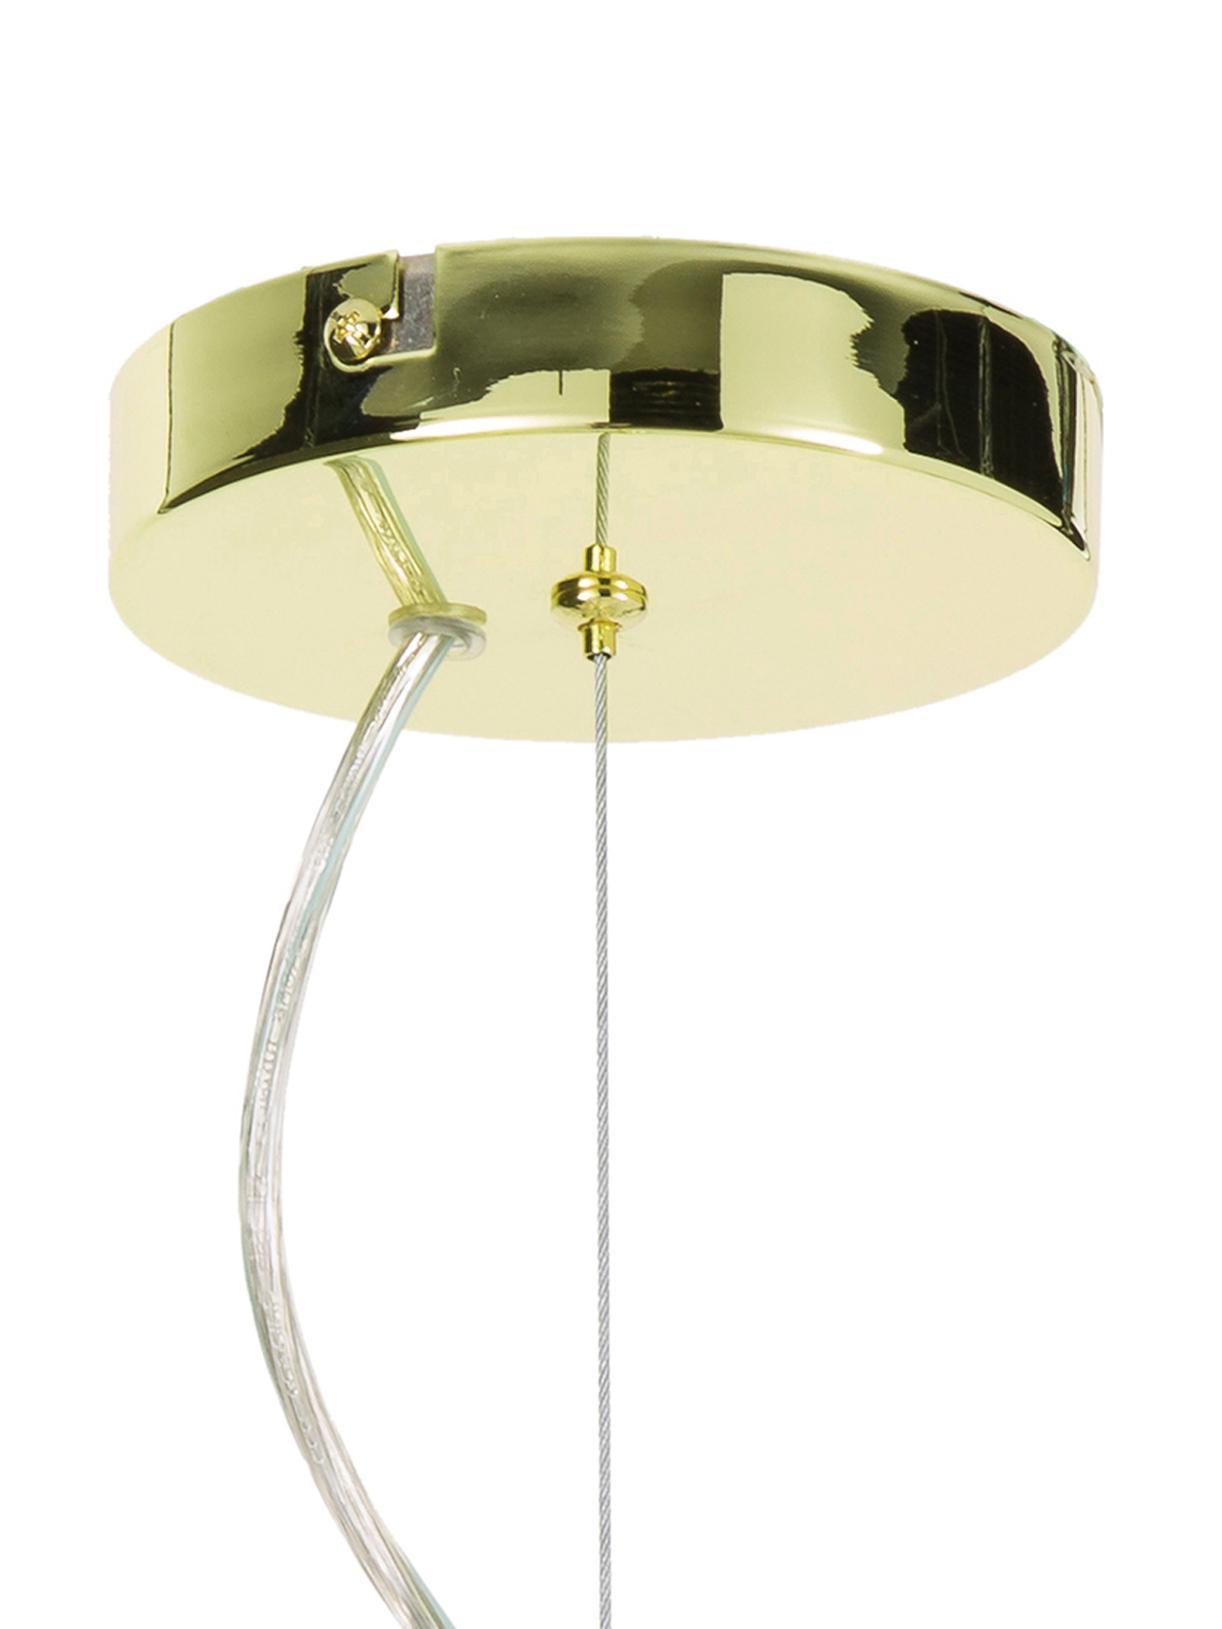 Grosse Pendelleuchte Spike in Gold, Baldachin: Metall, Lampenschirm: Metall, Goldfarben, Ø 90 cm